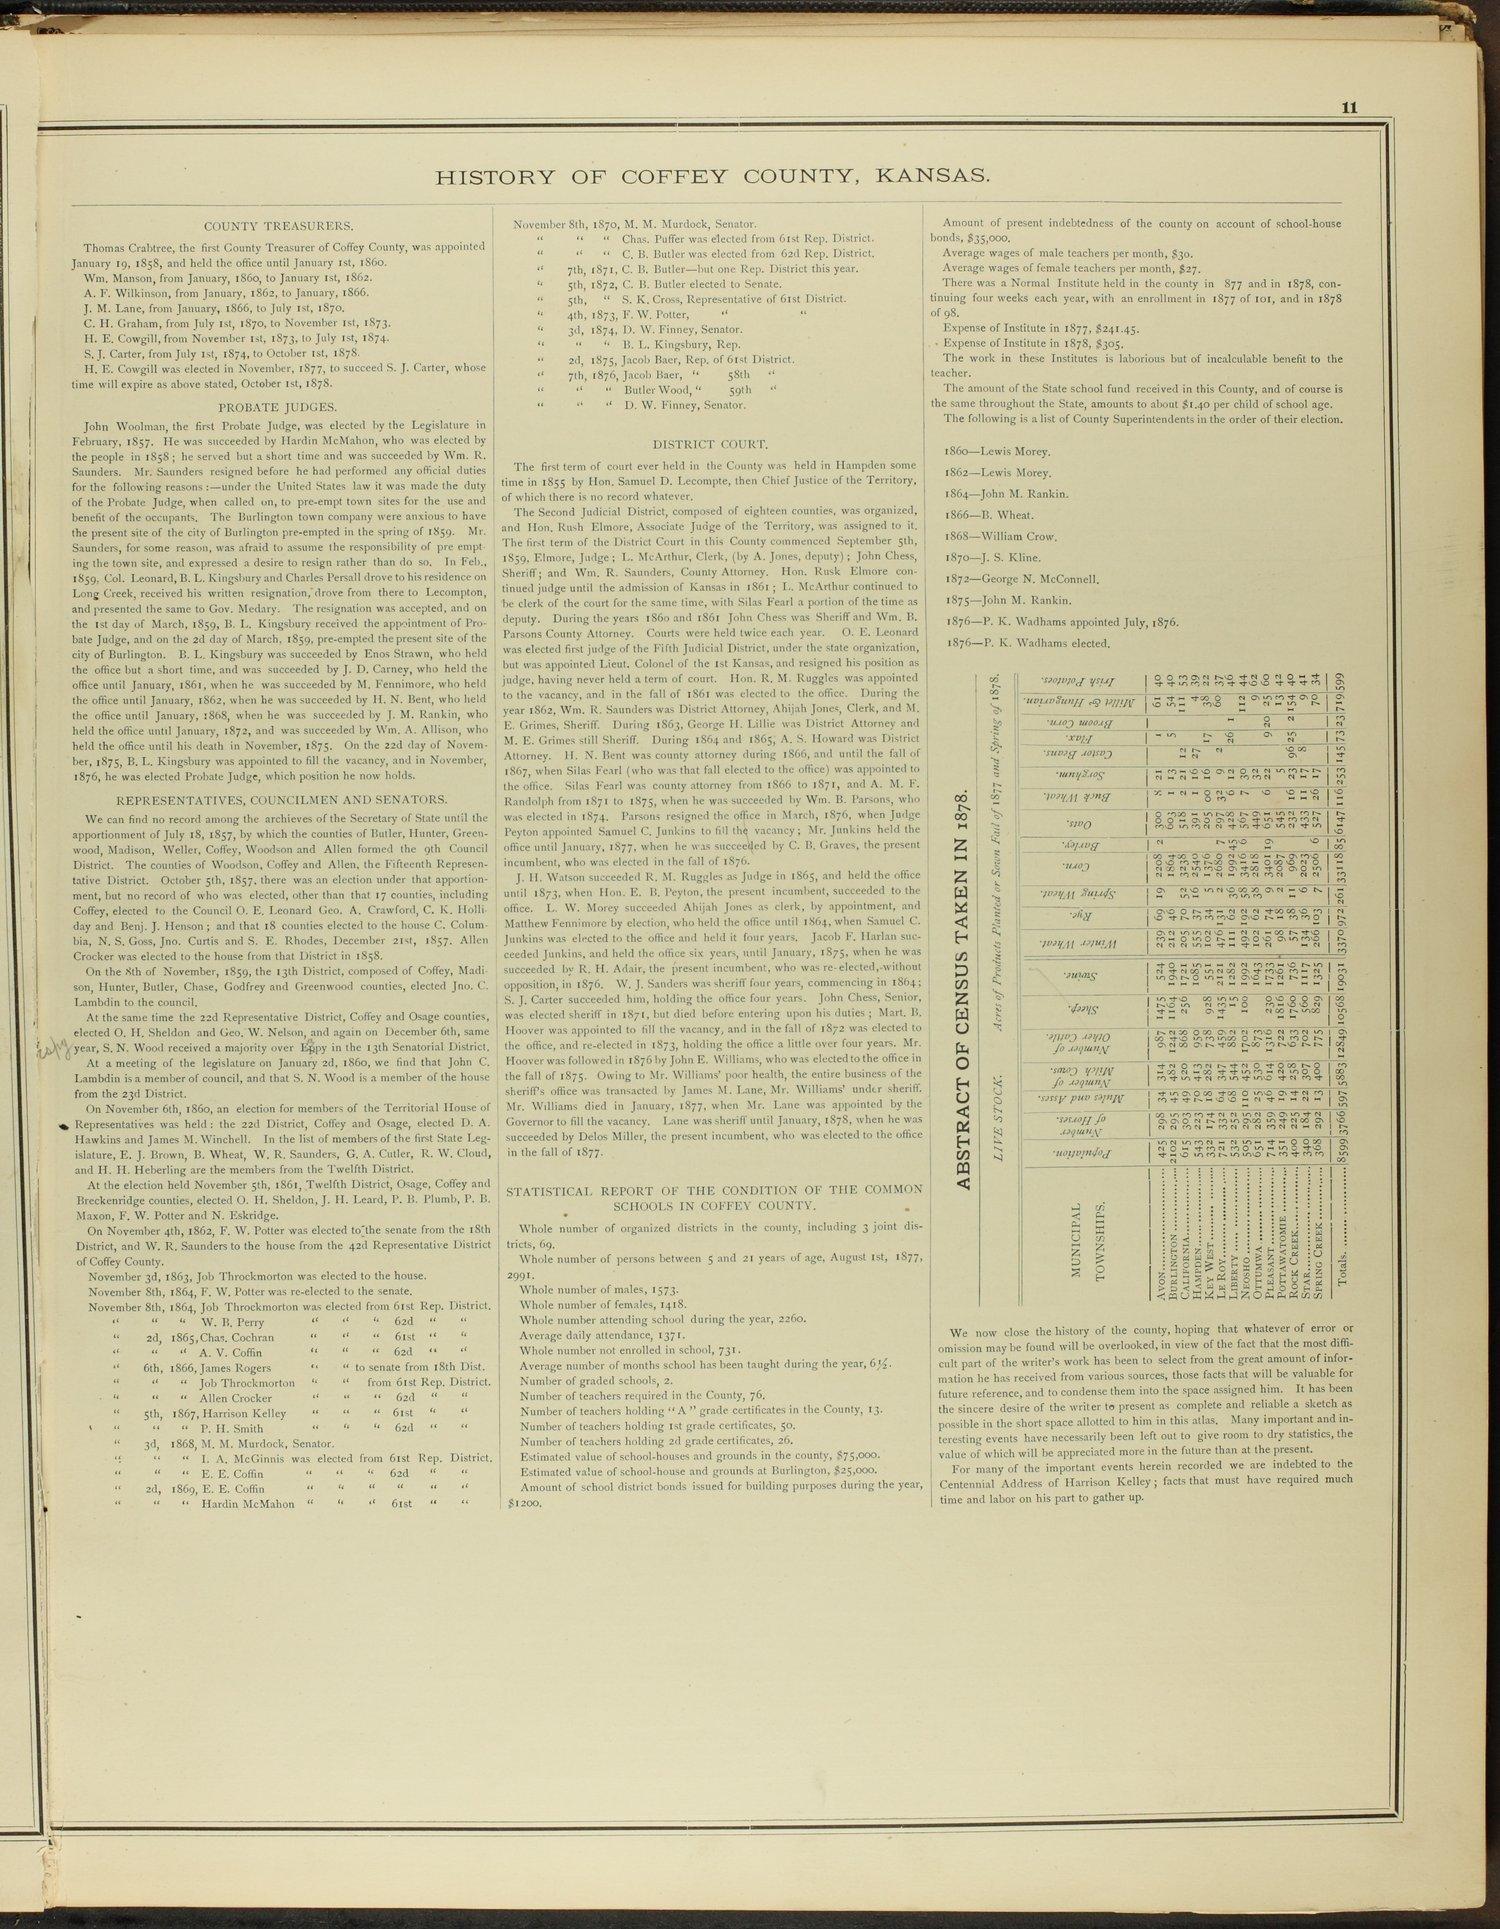 An illustrated historical atlas of Coffey County, Kansas - 11